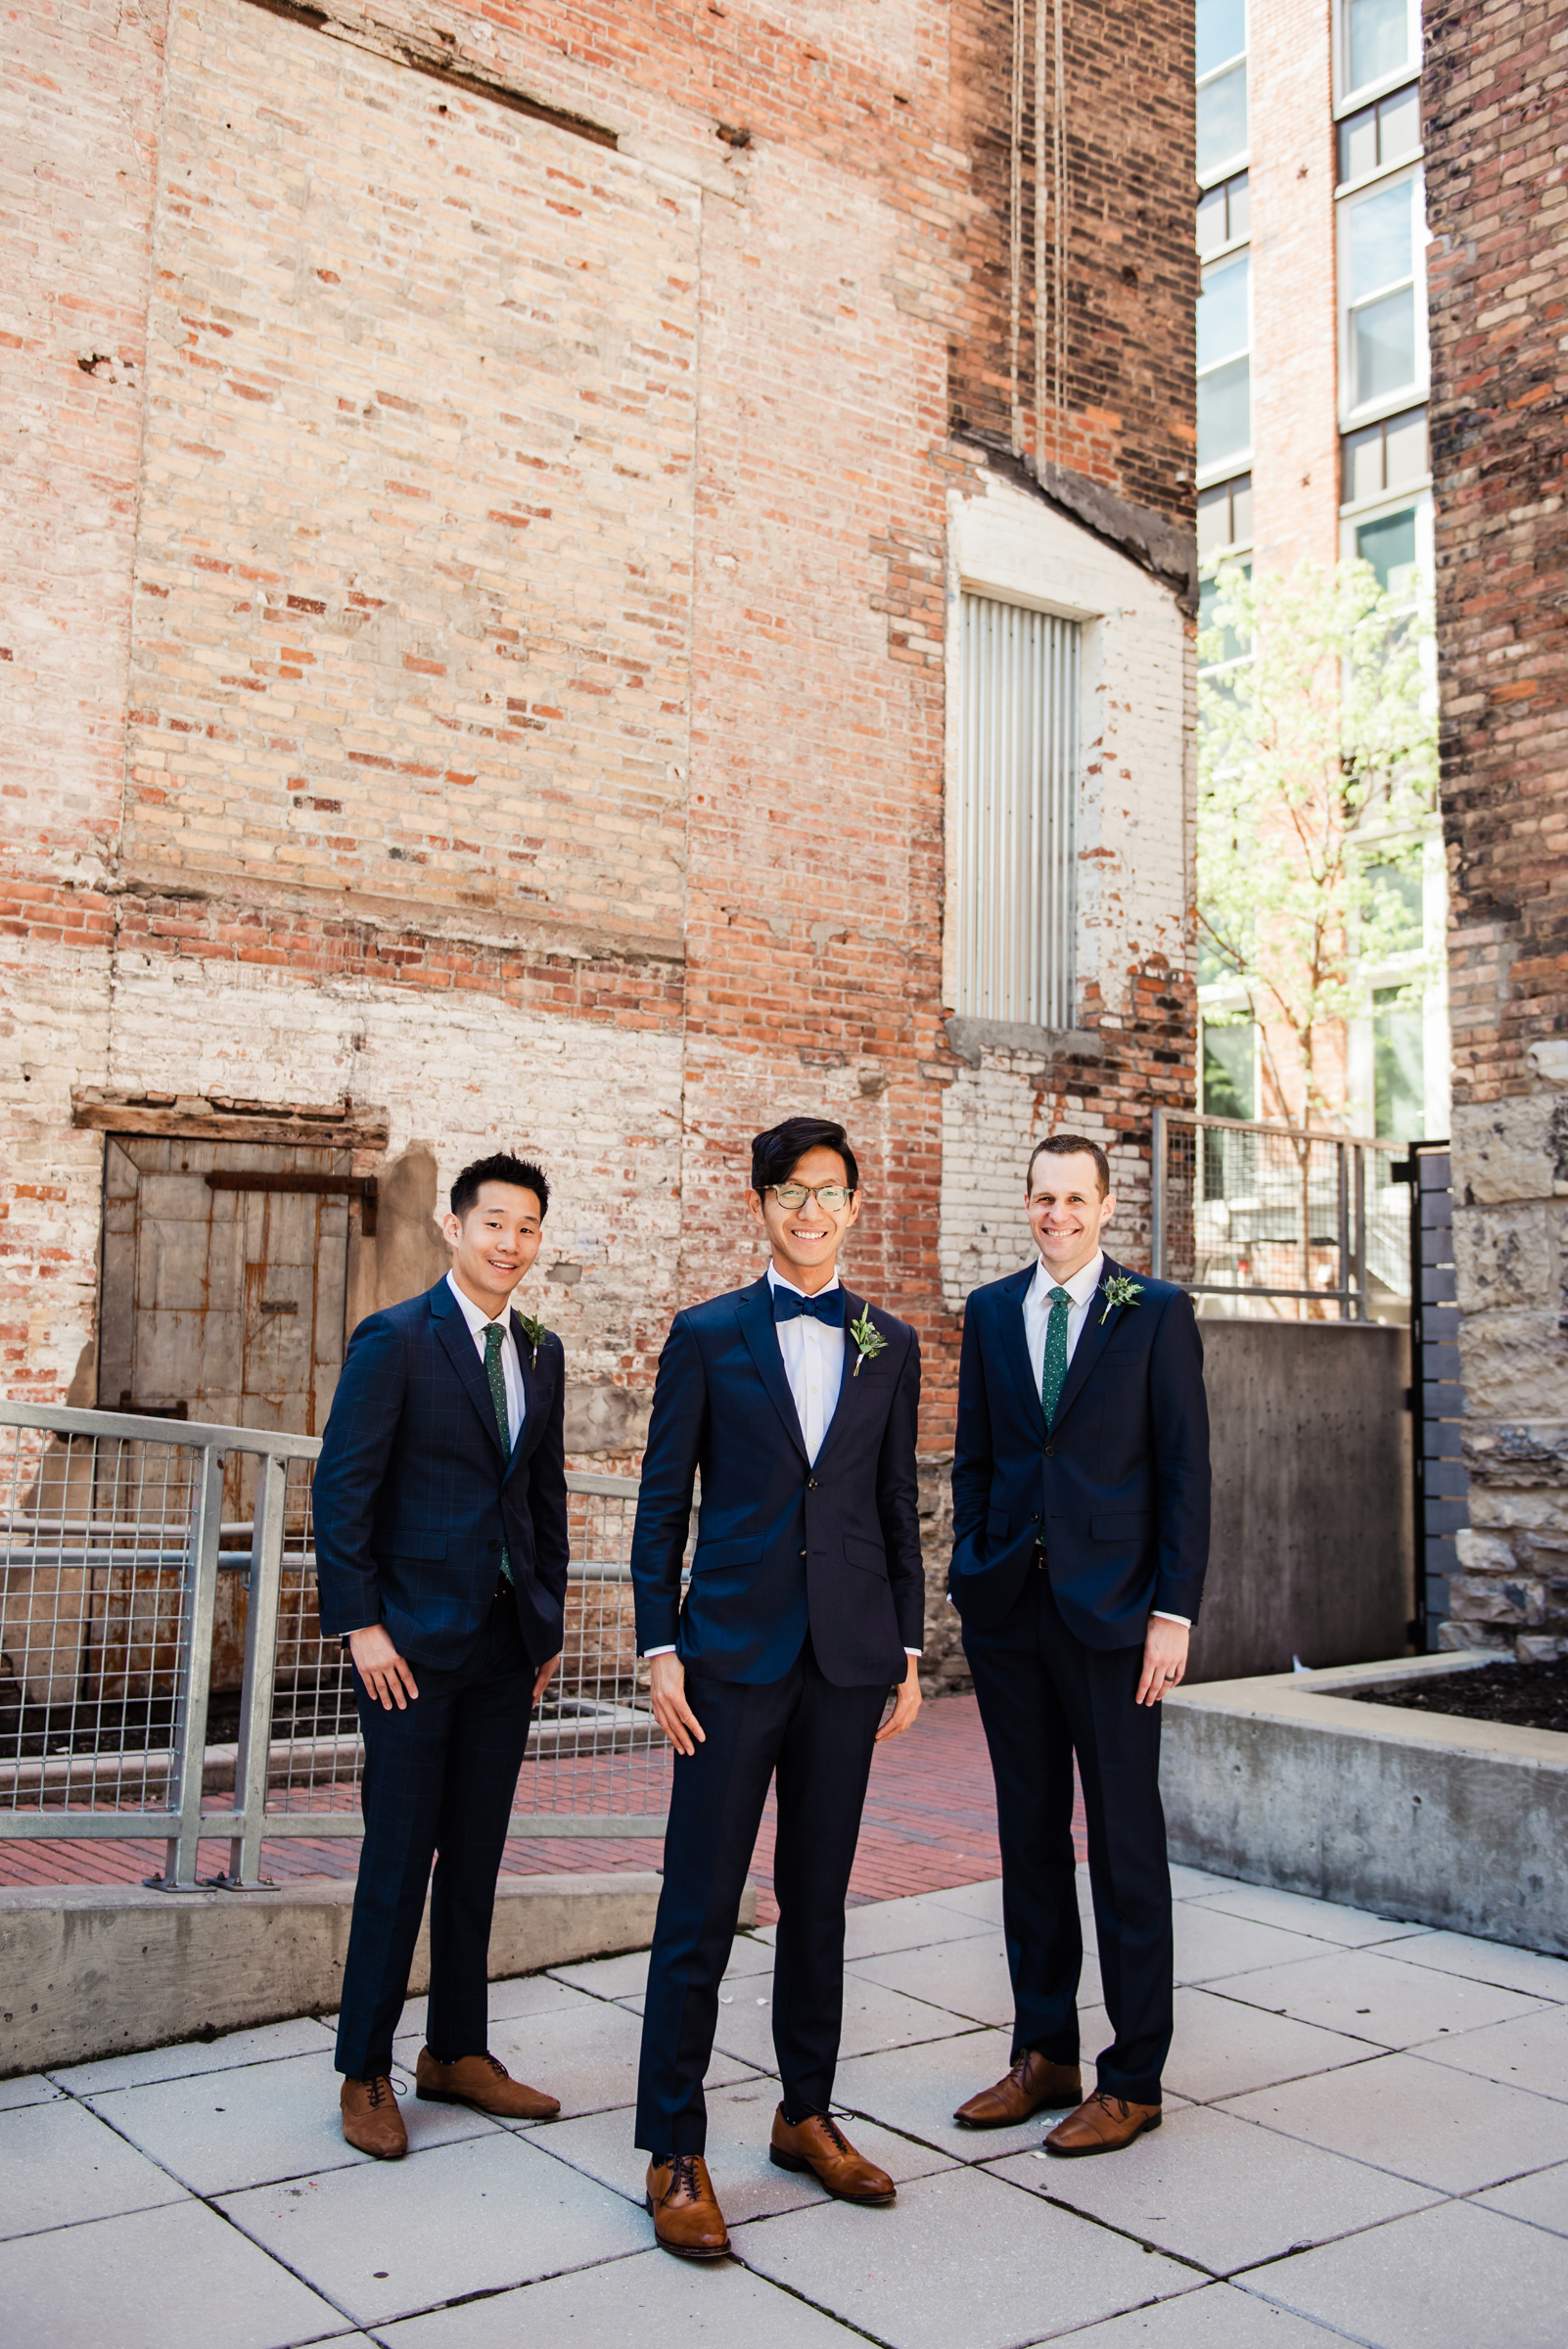 SKY_Armory_Syracuse_Wedding_JILL_STUDIO_Rochester_NY_Photographer_DSC_5490.jpg